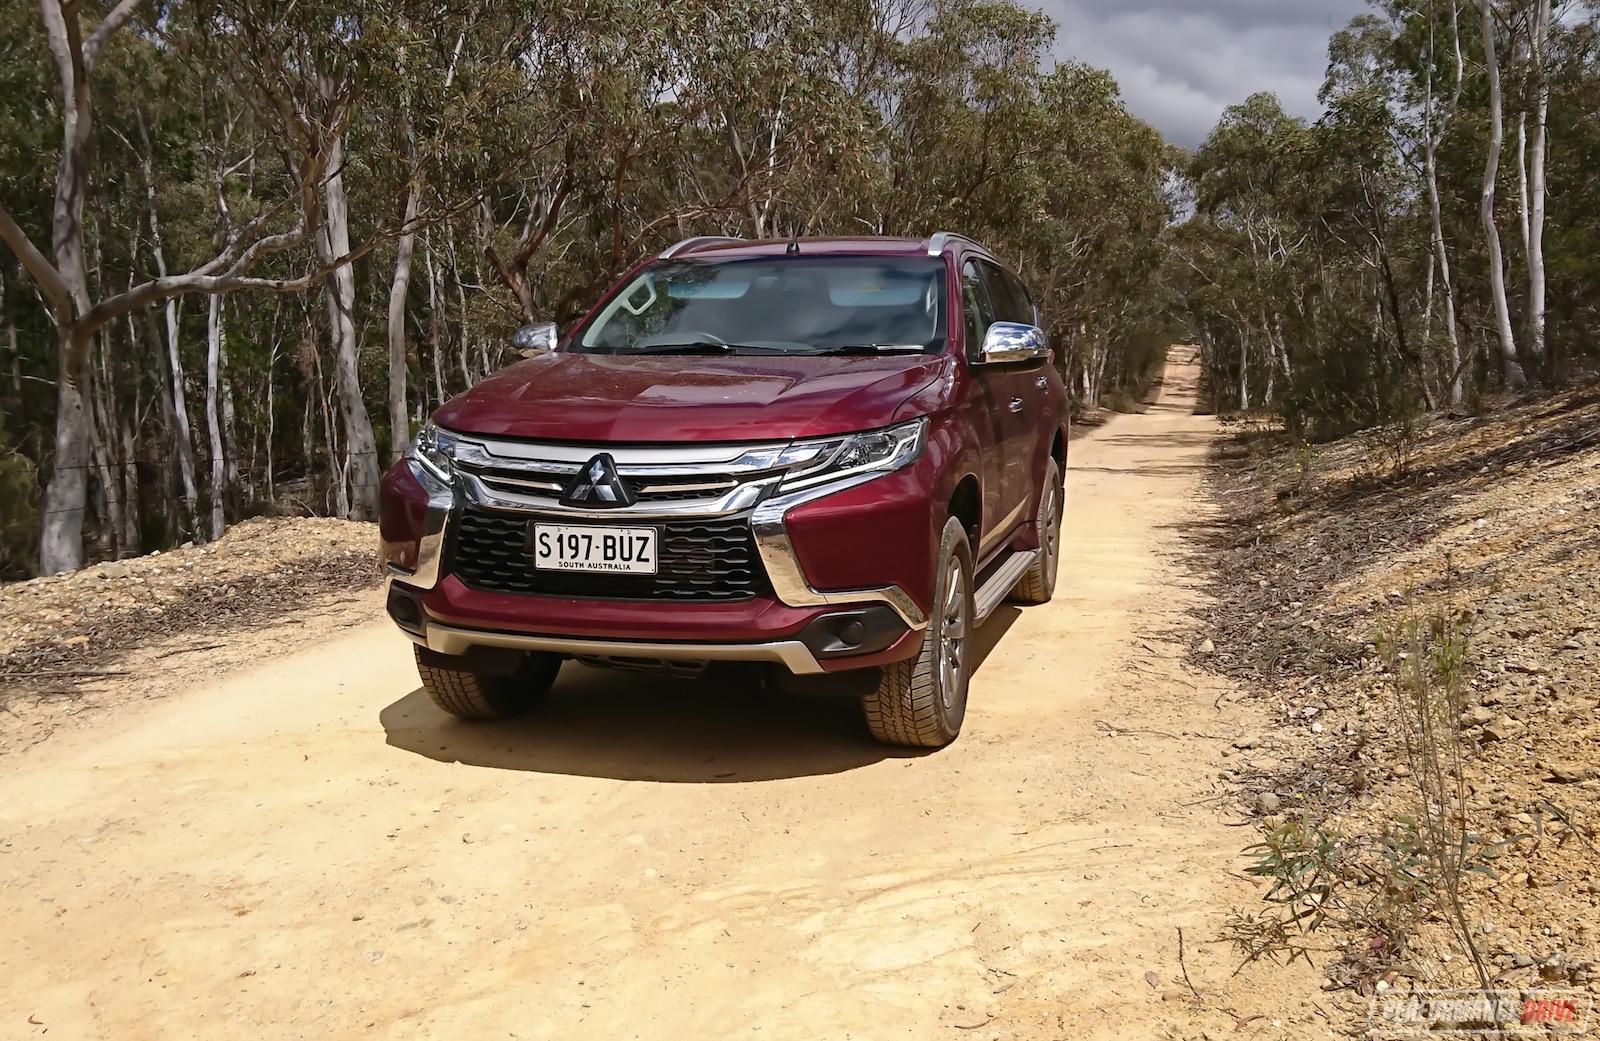 2018 Mitsubishi Pajero Sport GLX Review (video